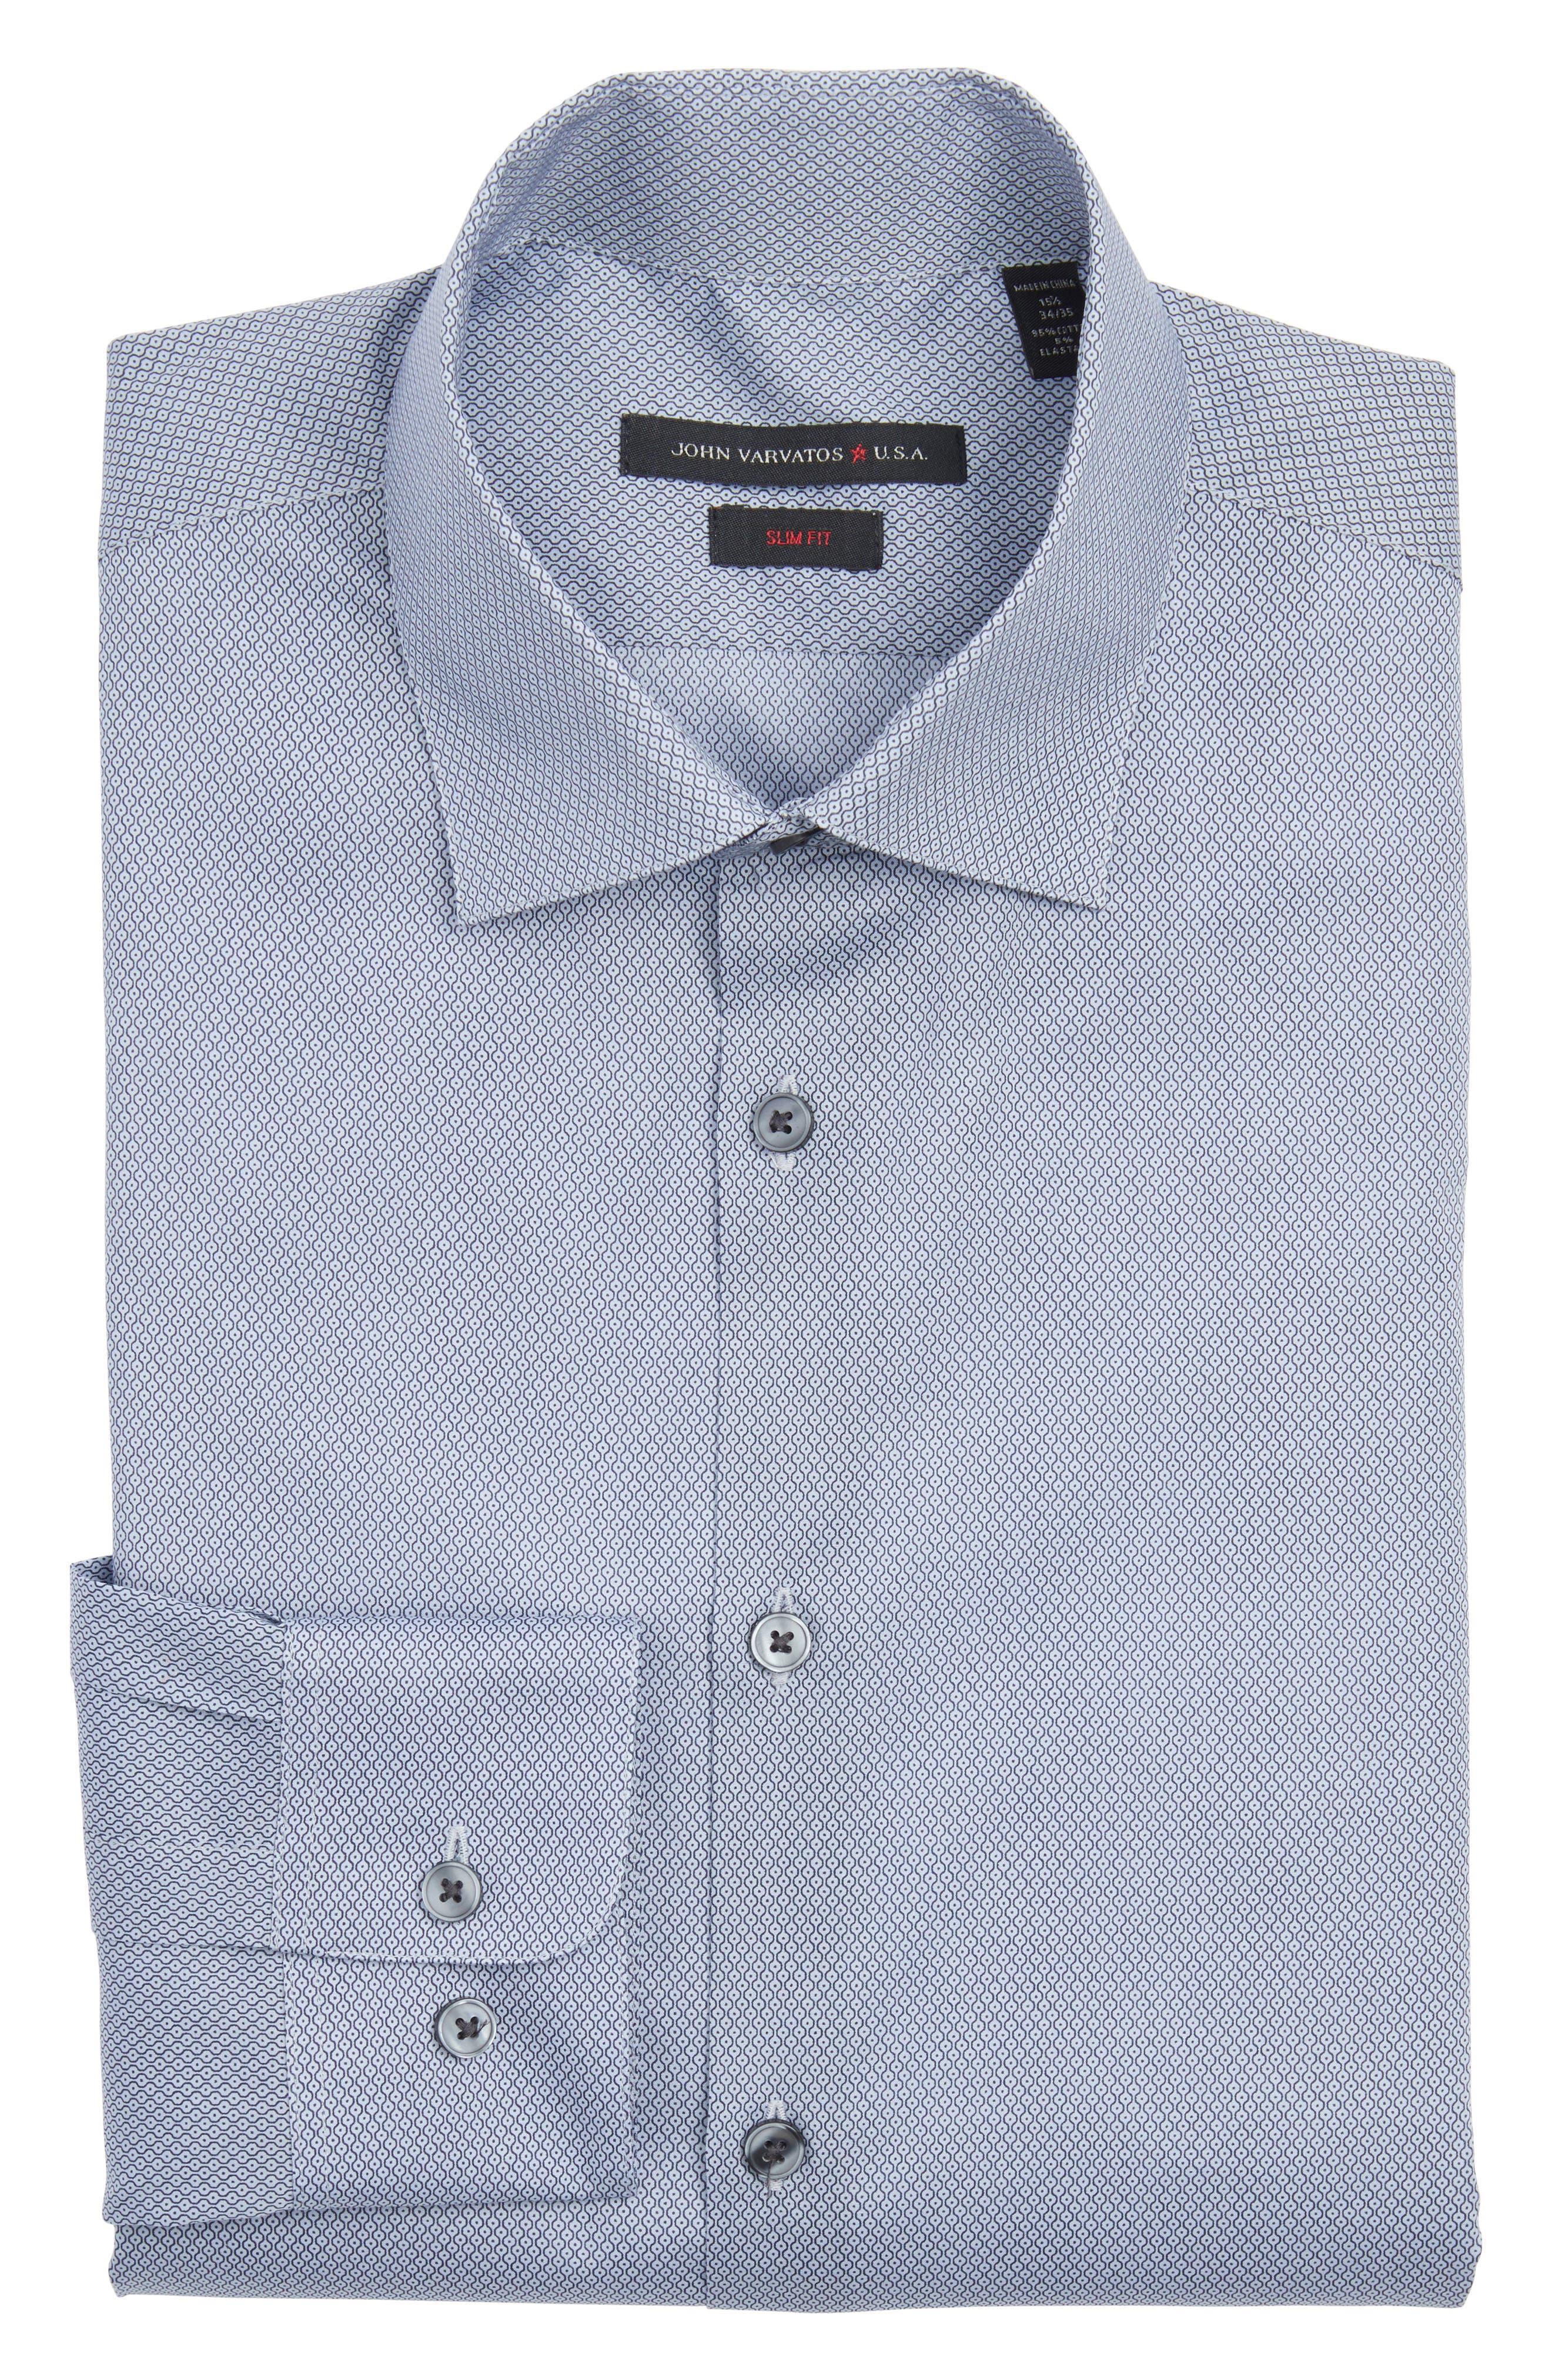 JOHN VARVATOS STAR USA Slim Fit Geometric Dress Shirt